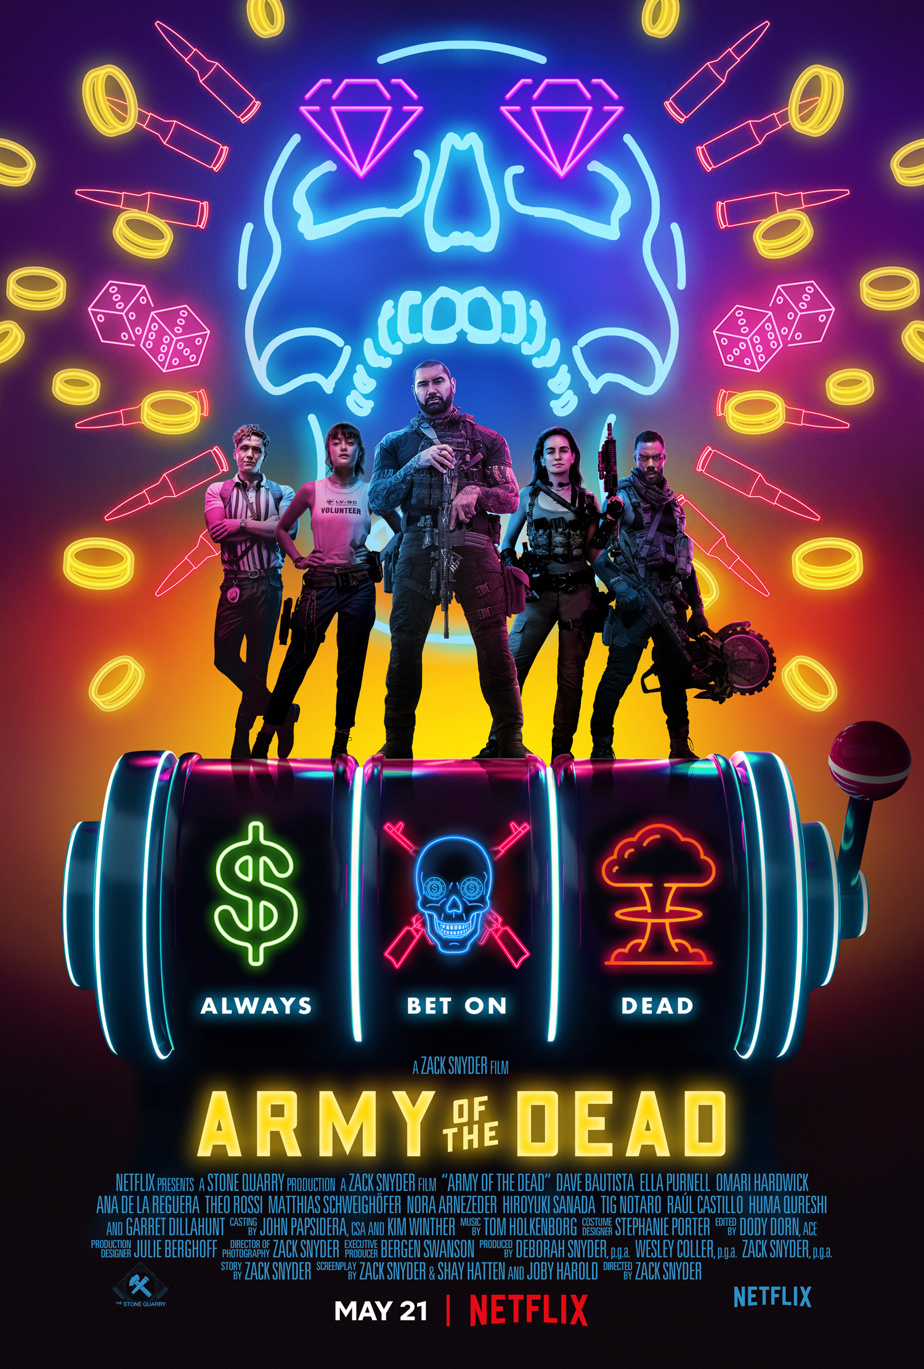 Army of the Dead (V. F.: L'armée des morts)